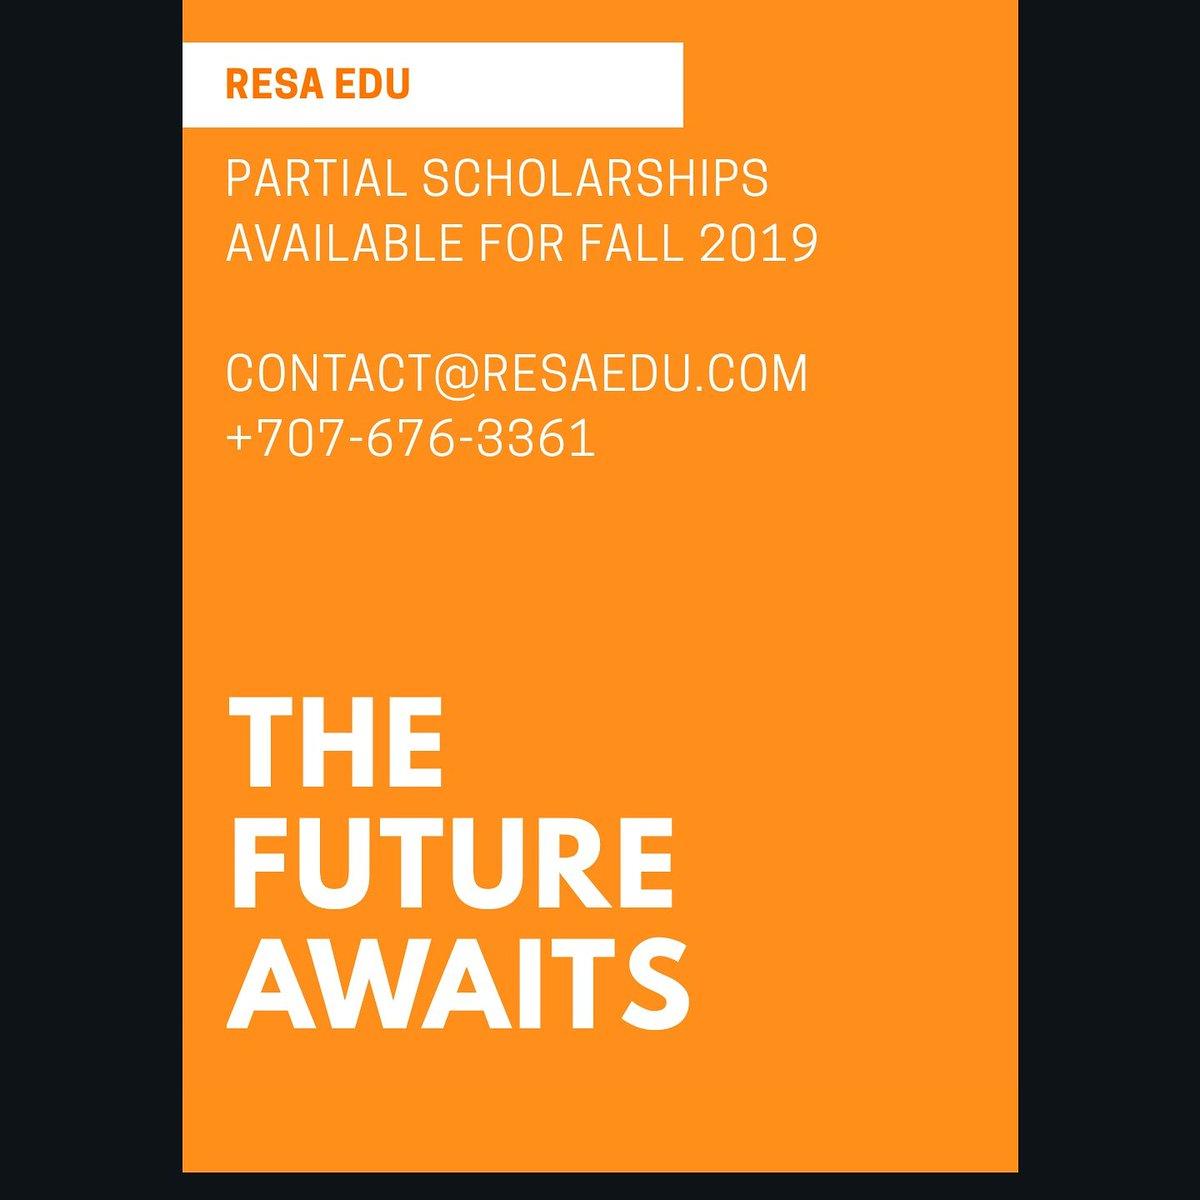 Offering partial #scholarships in universities in the #US. DM us now for more information. #البحرين #السعودية #قطر #الامارات #الكويت #اليمن #عمان #لبنان #الاردن #سوريا #العراق #مصر